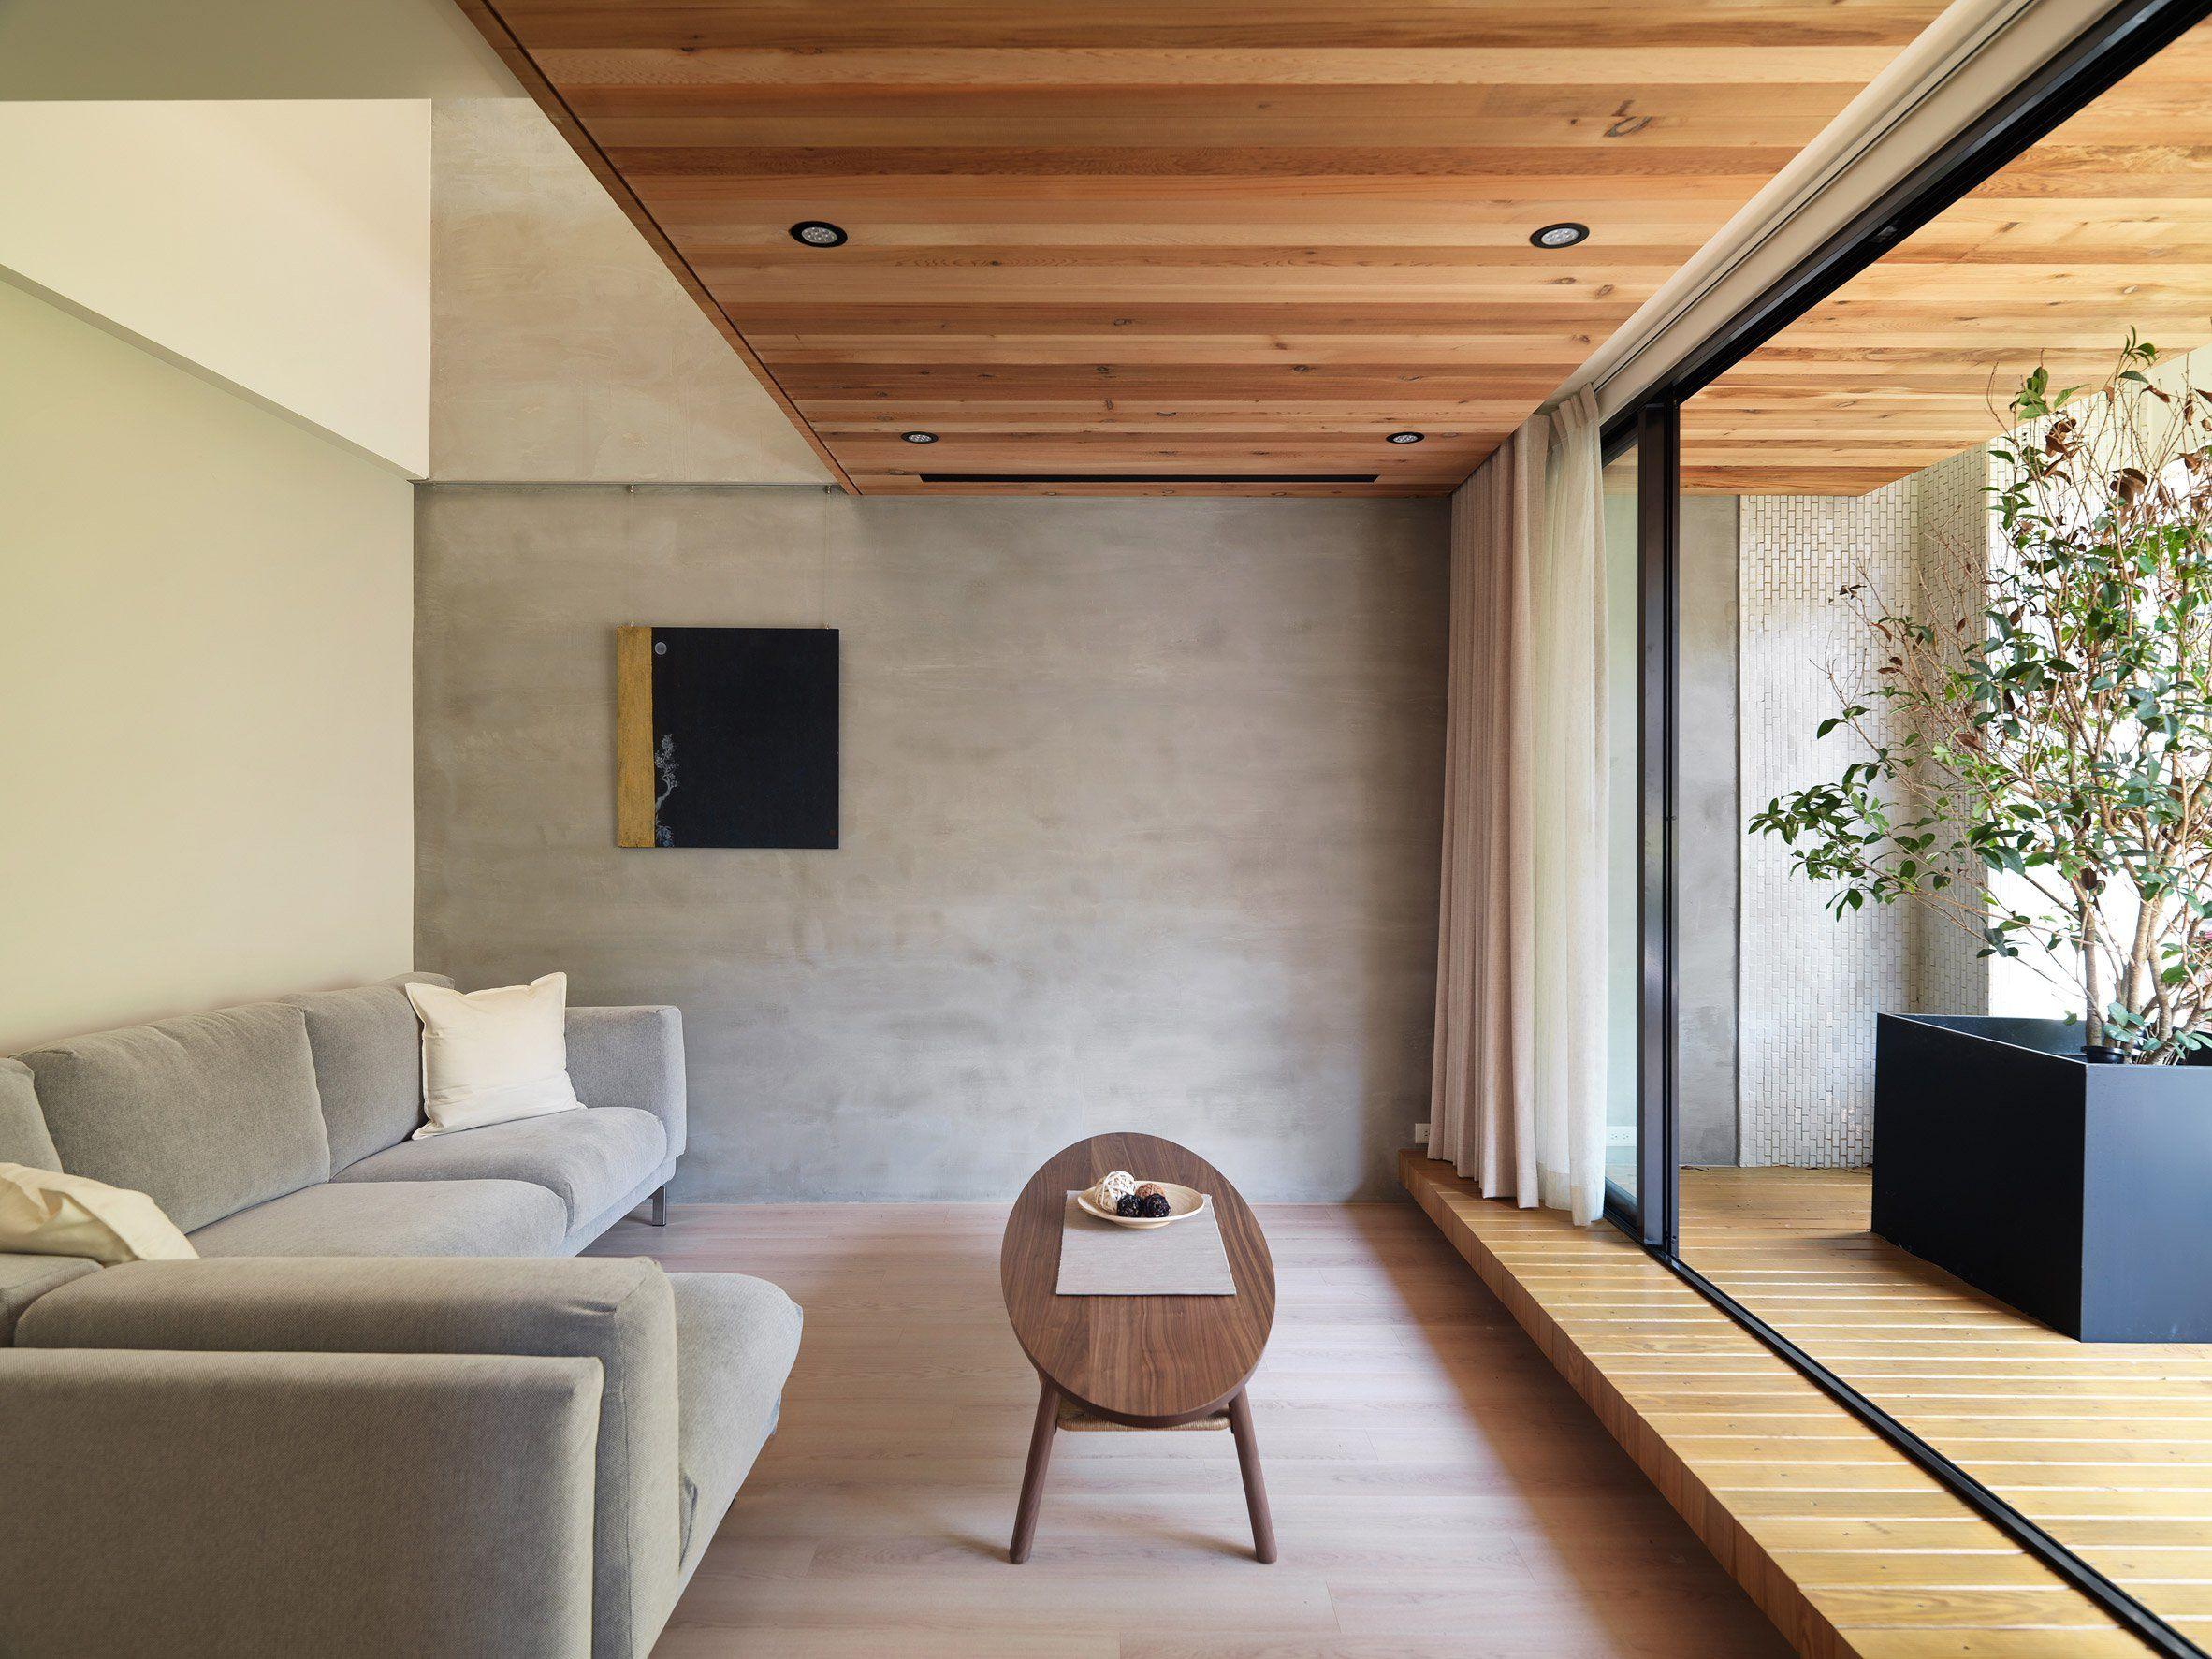 Wabi-Sabi house by Soar Design | Home Interior Design | Pinterest ...